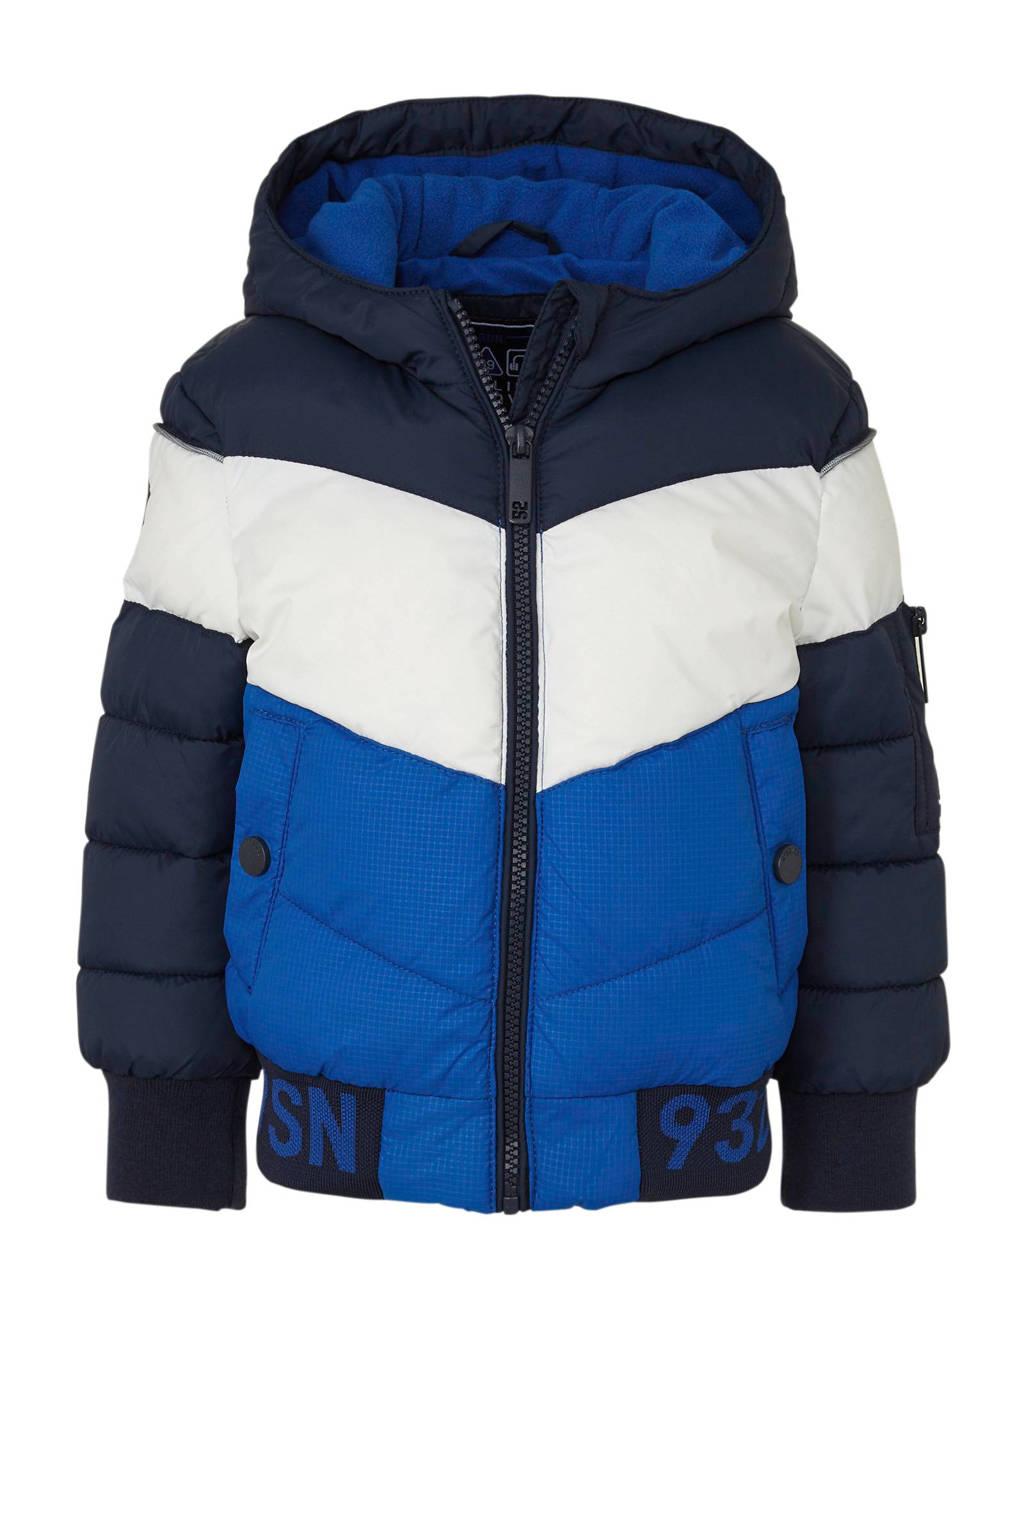 C&A Palomino winterjas met tekst blauw, Blauw